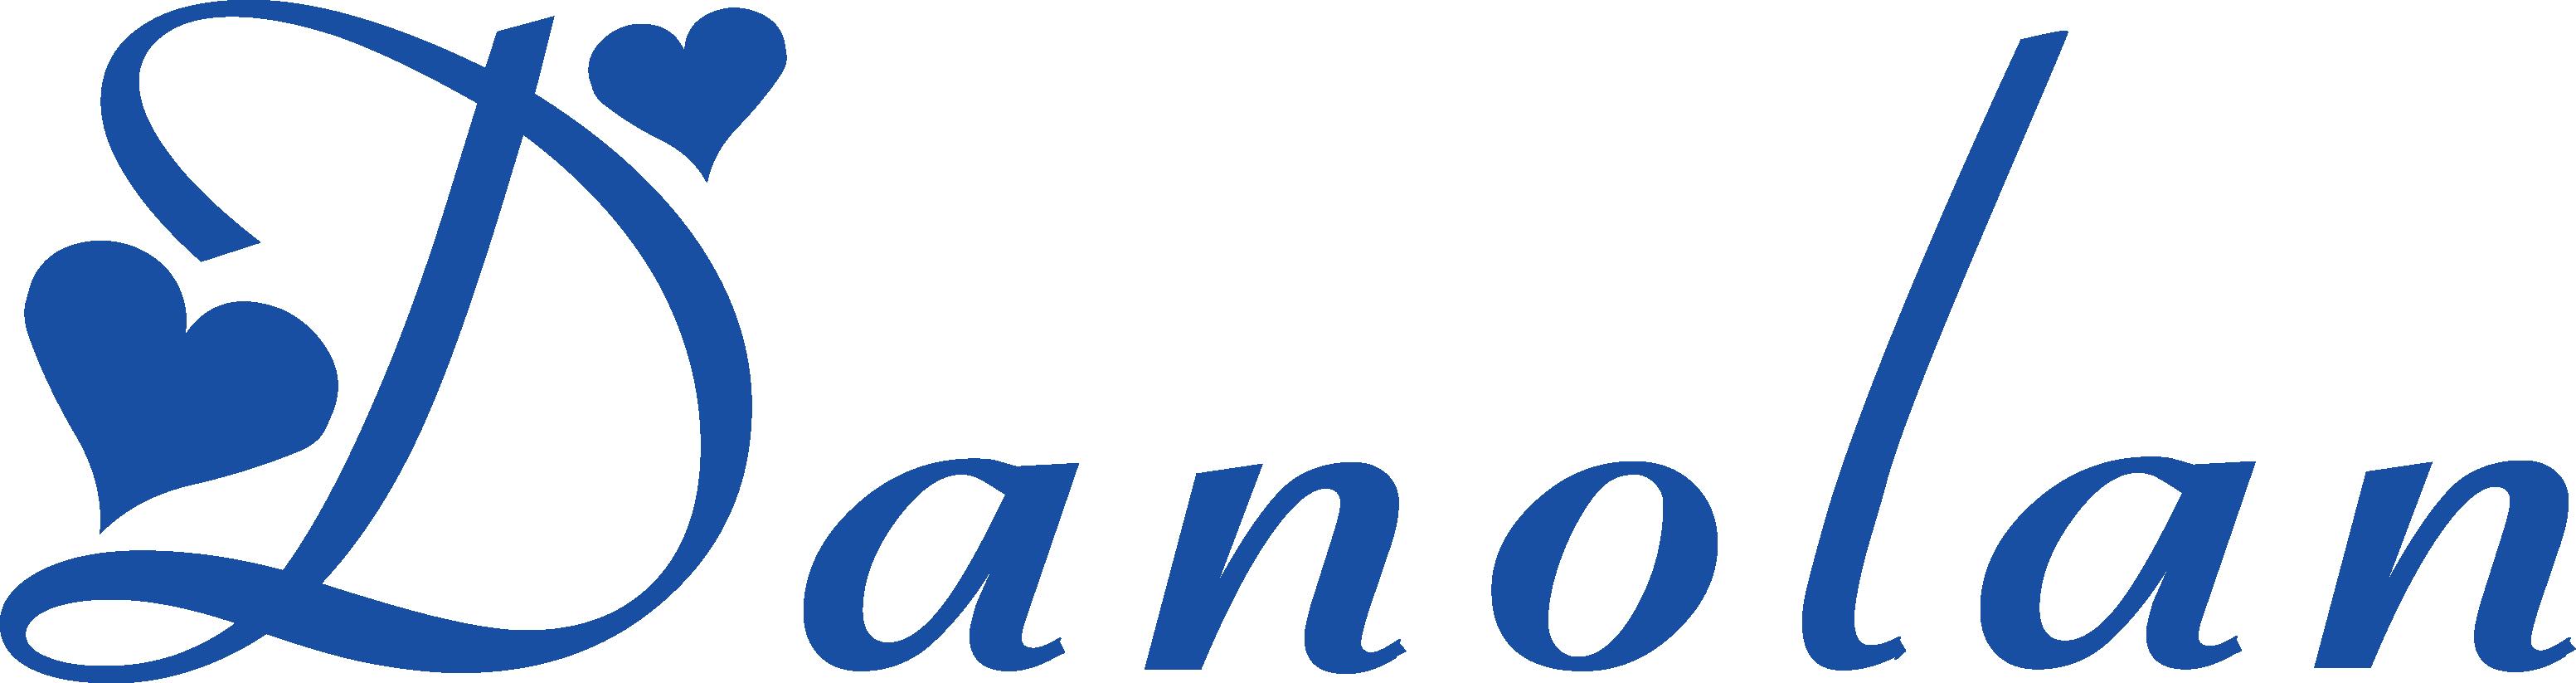 Danolan - Magnetsmykker, magnetmadrasser og uldsengetøj